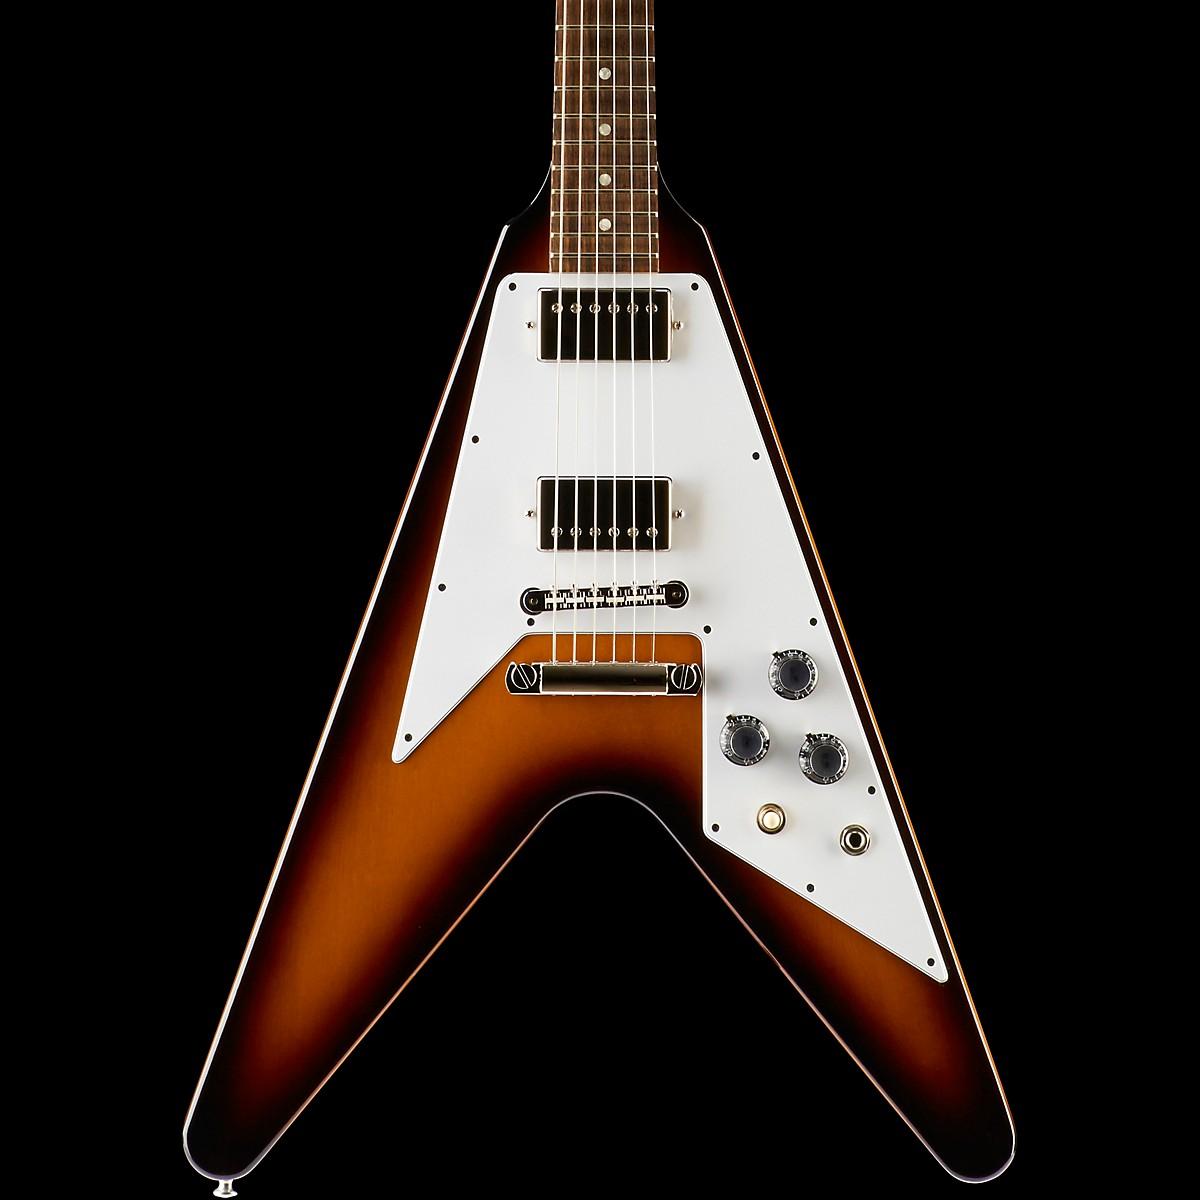 Gibson Custom 1967 Flying V Electric Guitar